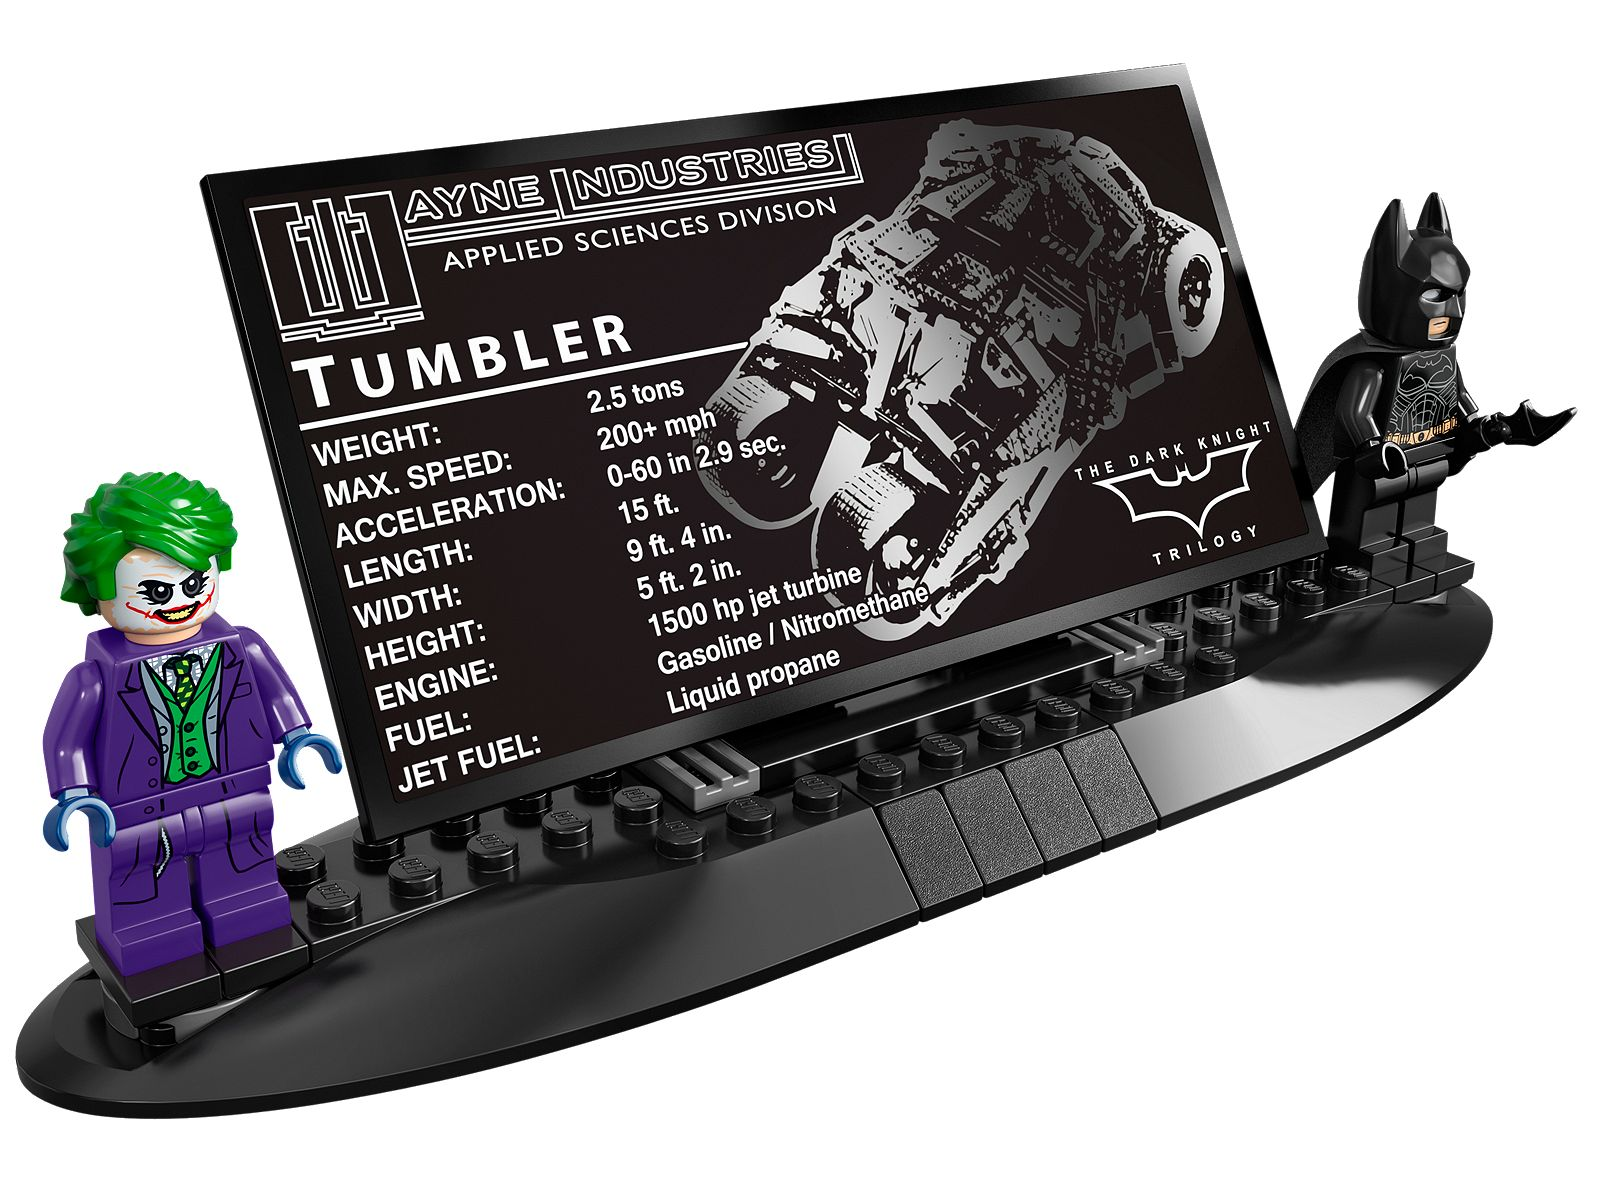 Lego Batman Tumbler Retiring Soon - Minifigure Price Guide